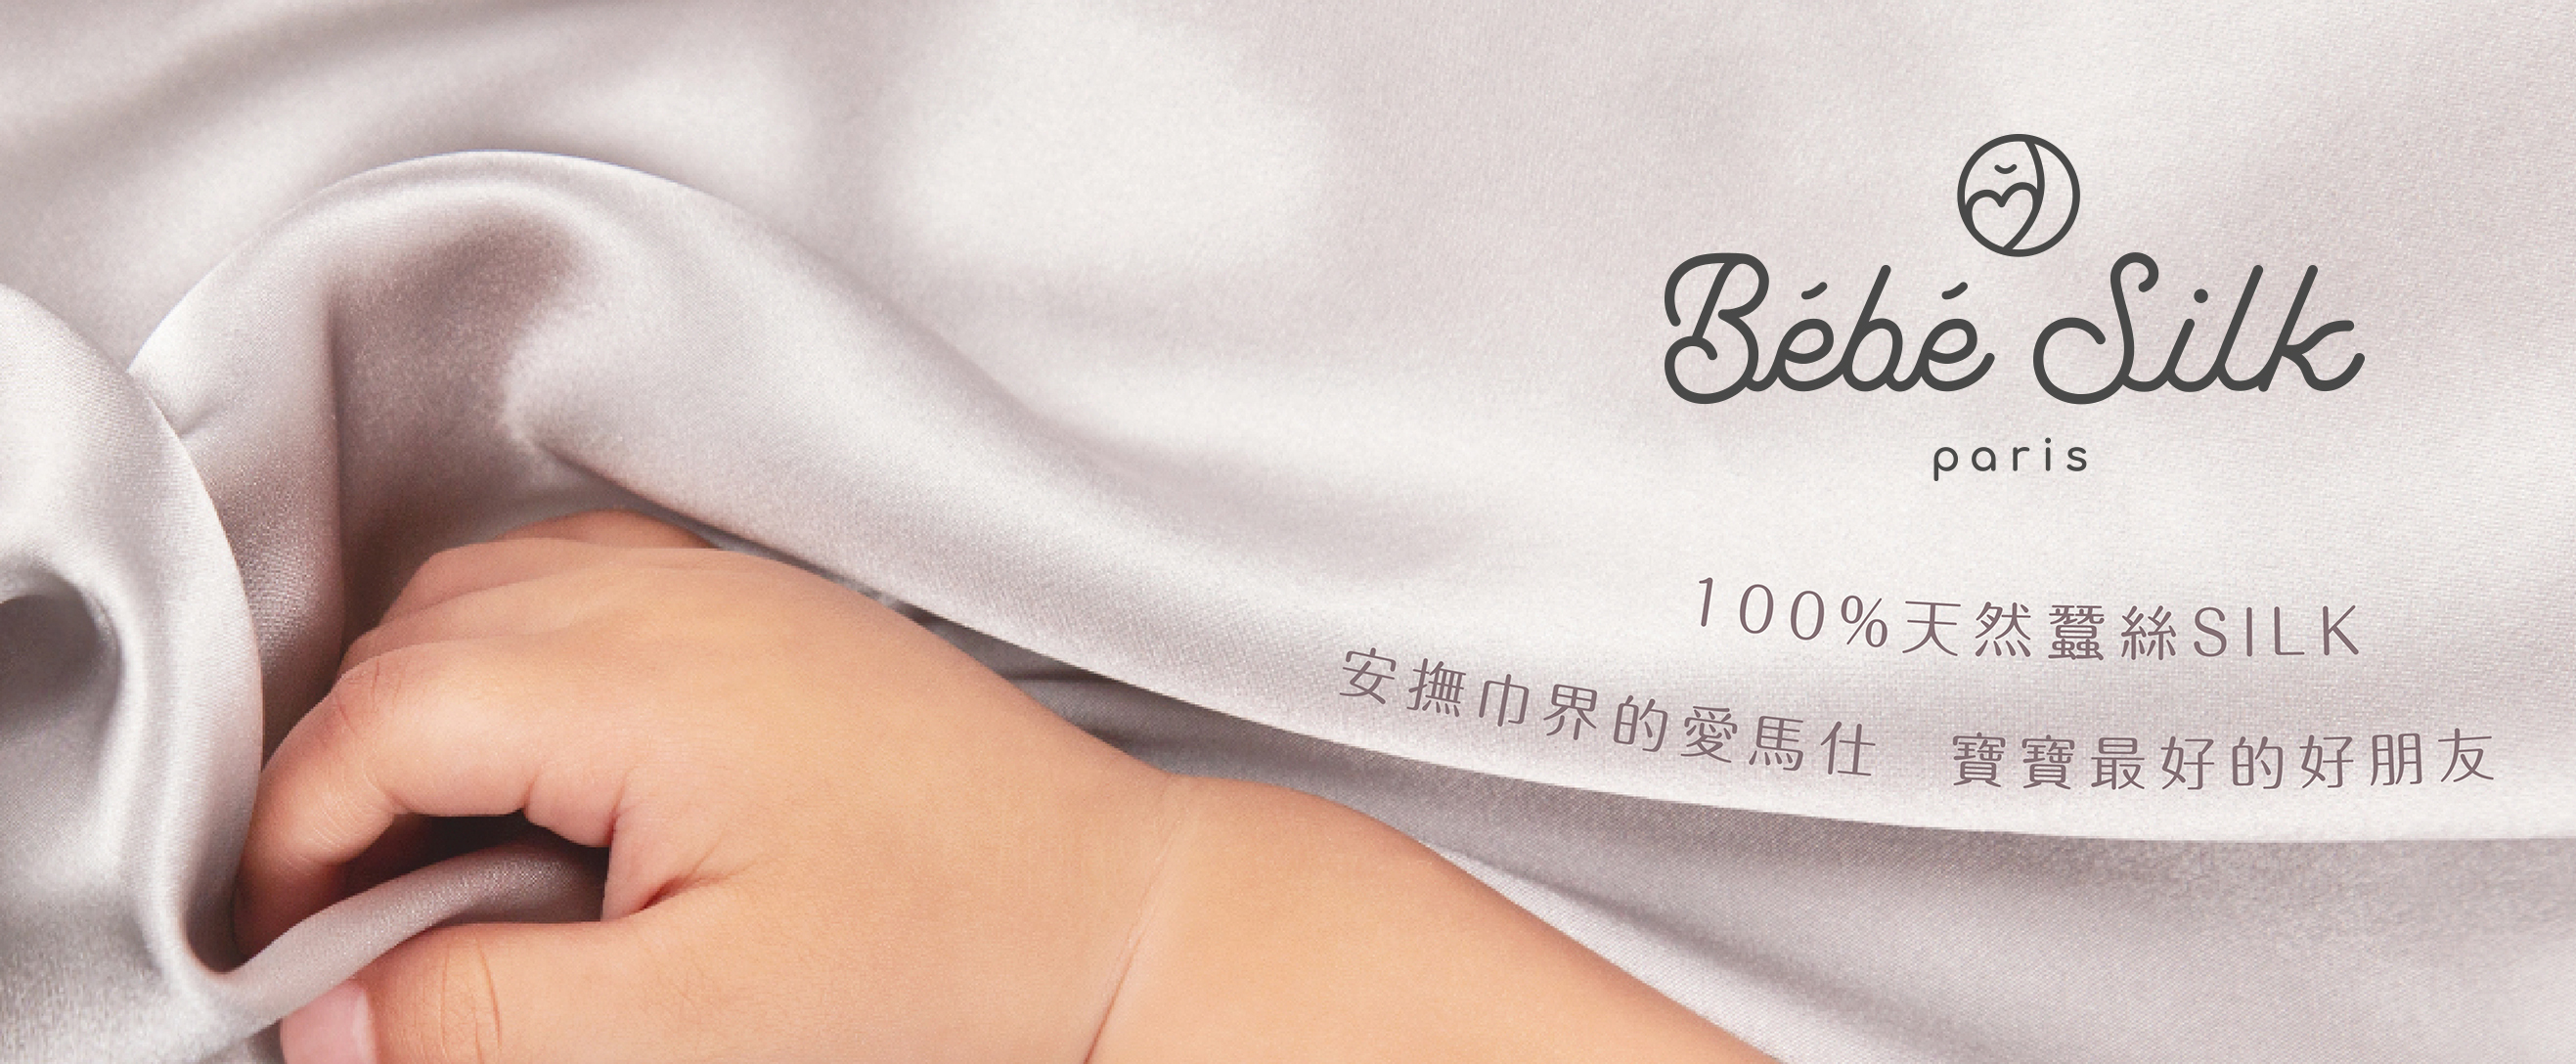 bebesilk, silk, soothing blankie, 安撫巾, 蠶絲